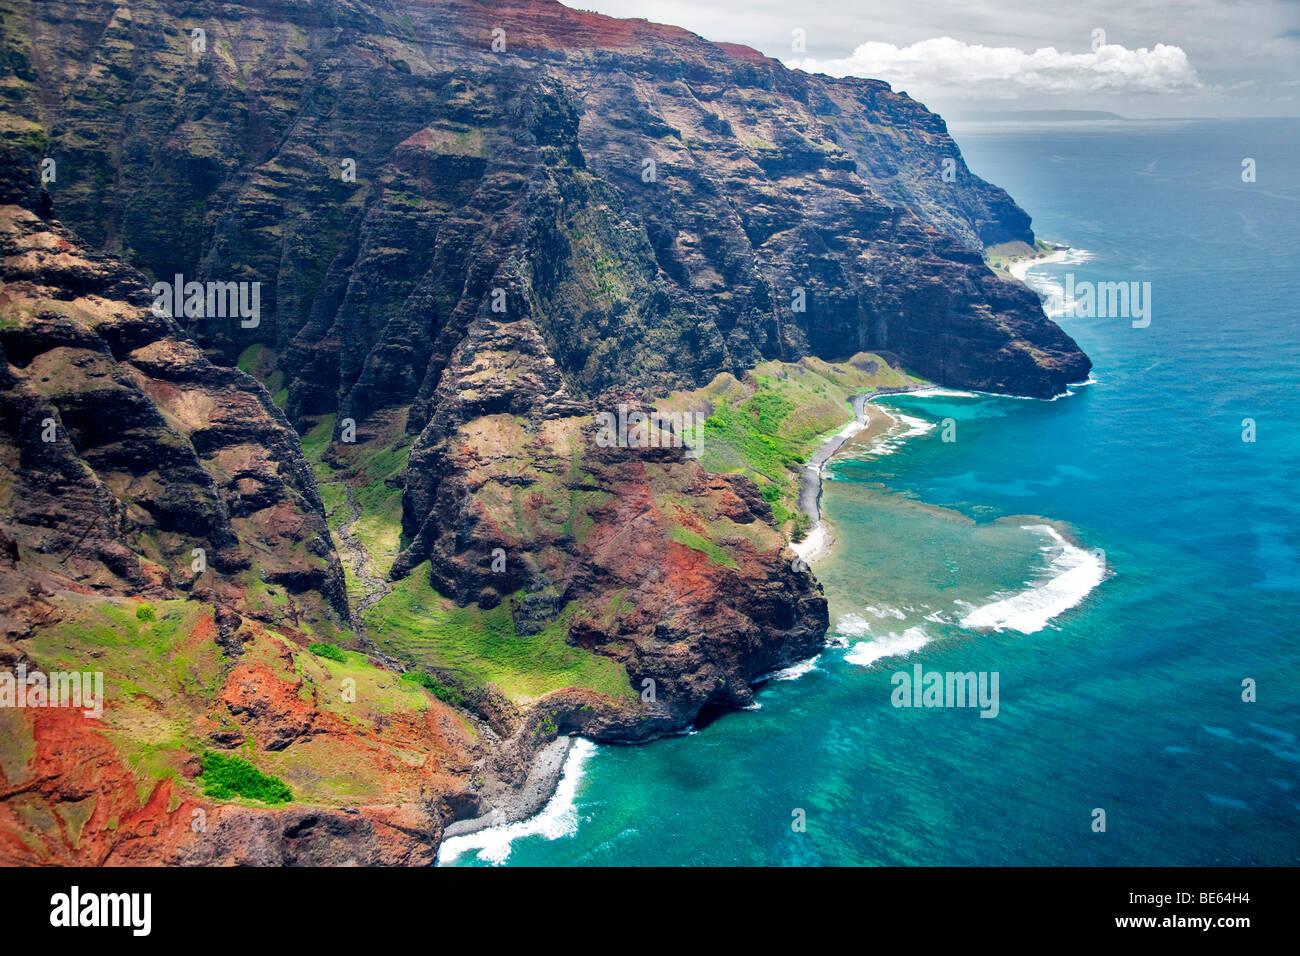 Na Pali Küste aus der Luft. Kauai, Hawaii. Stockbild